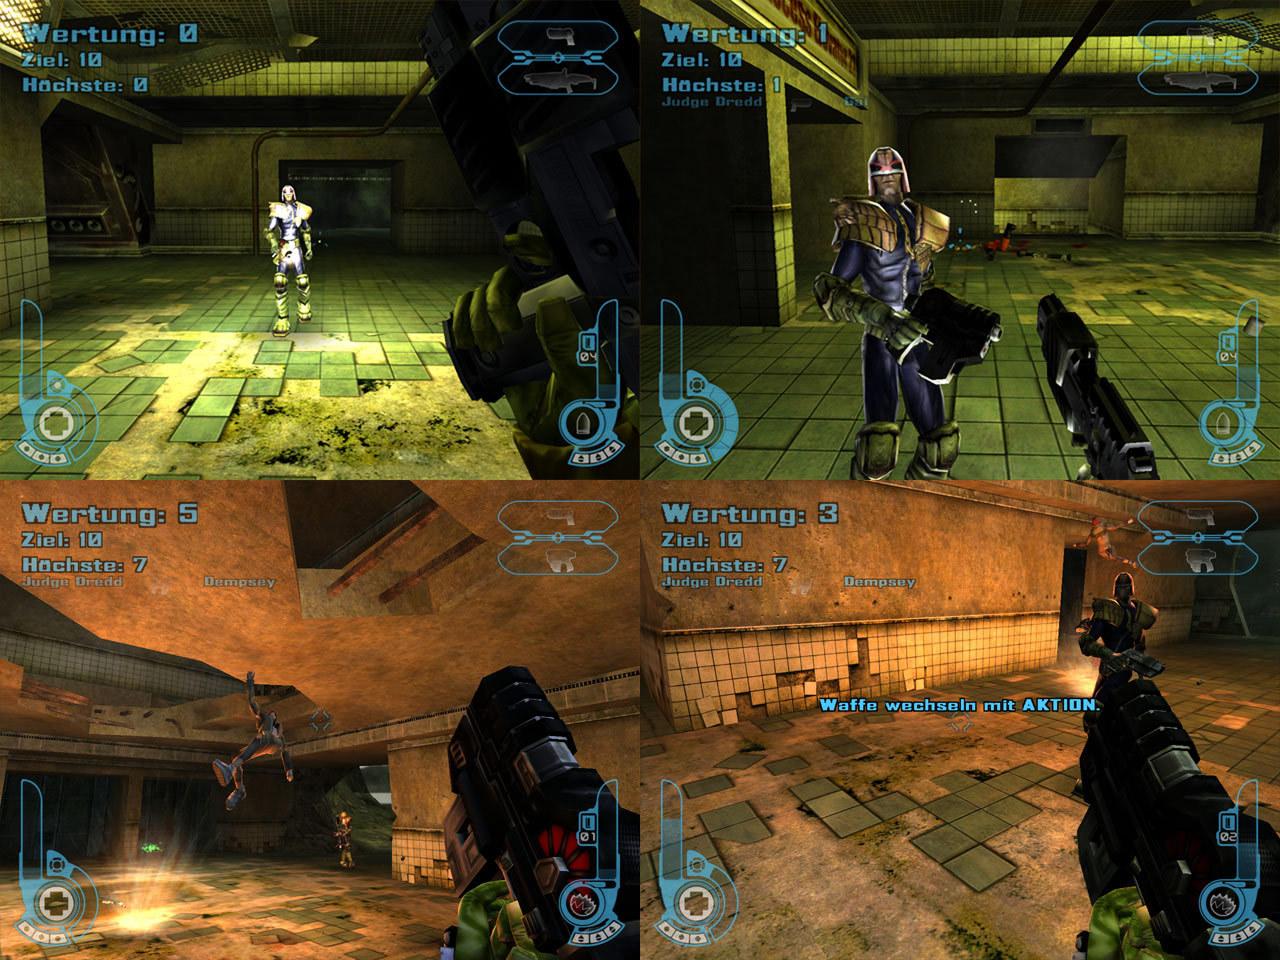 Judge Dredd: Dredd vs. Death screenshot 3